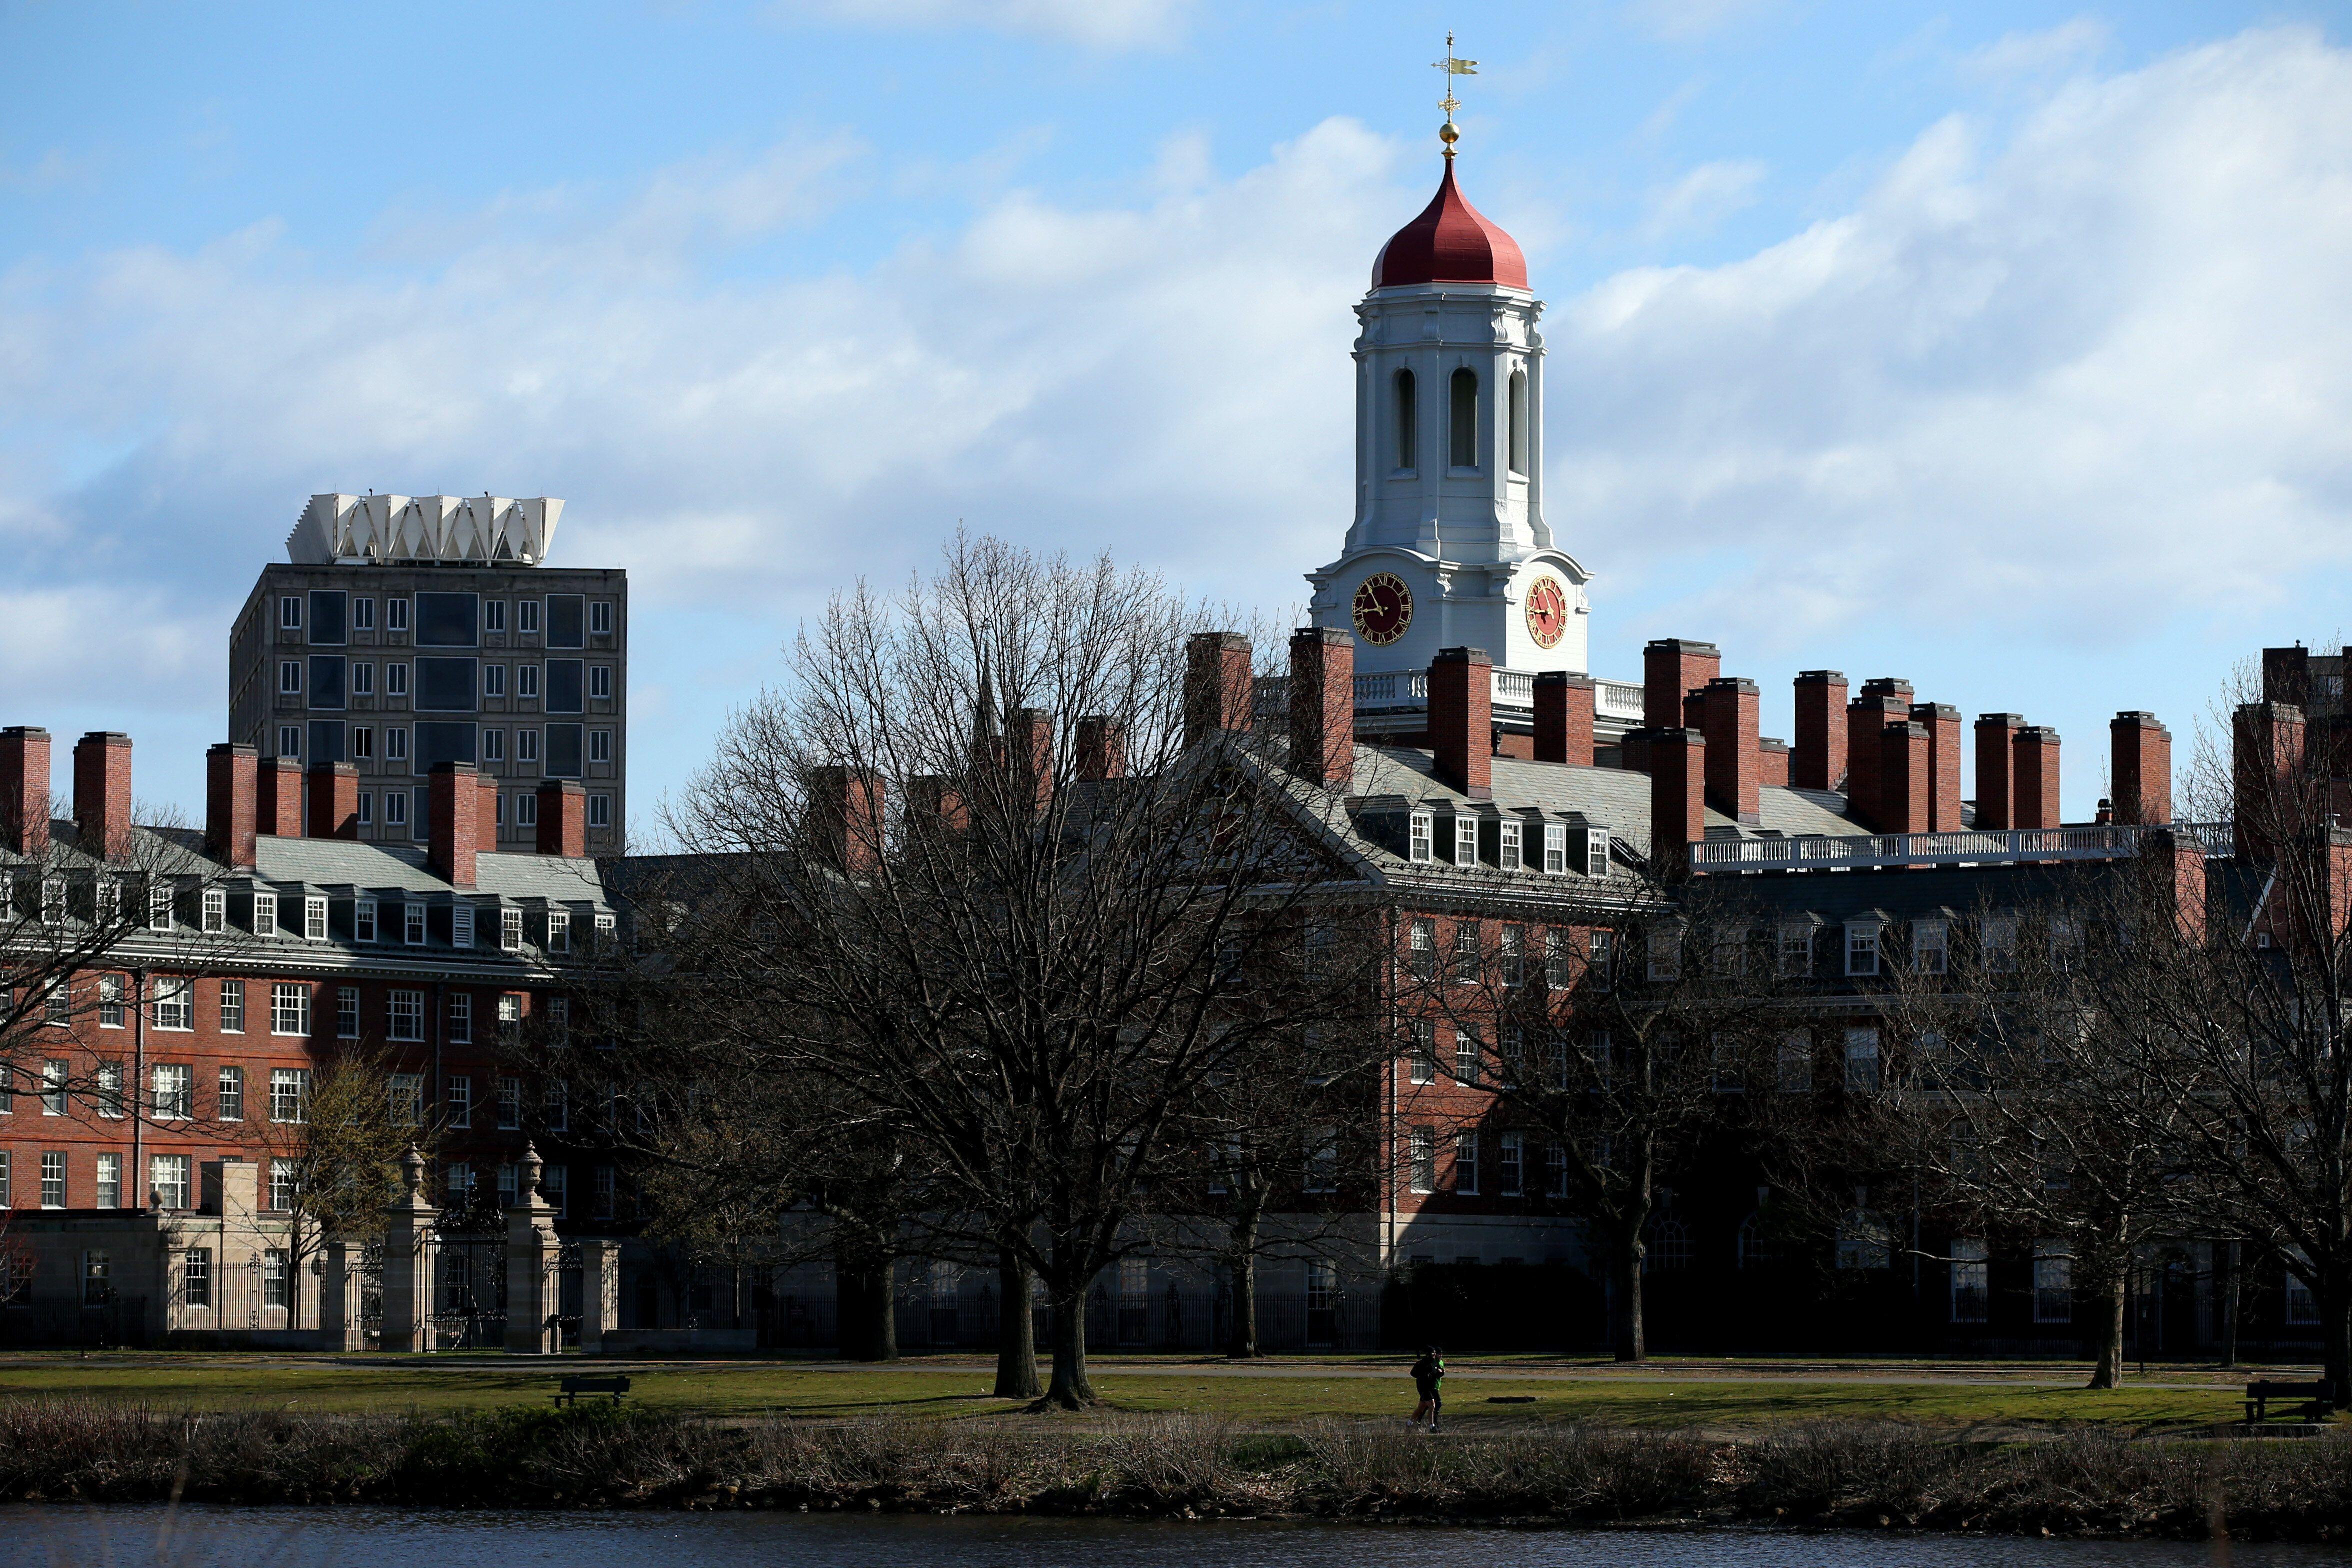 CAMBRIDGE, MASSACHUSETTS - APRIL 22: A general view of Harvard University campus is seen on April 22, 2020 in Cambridge, Mass